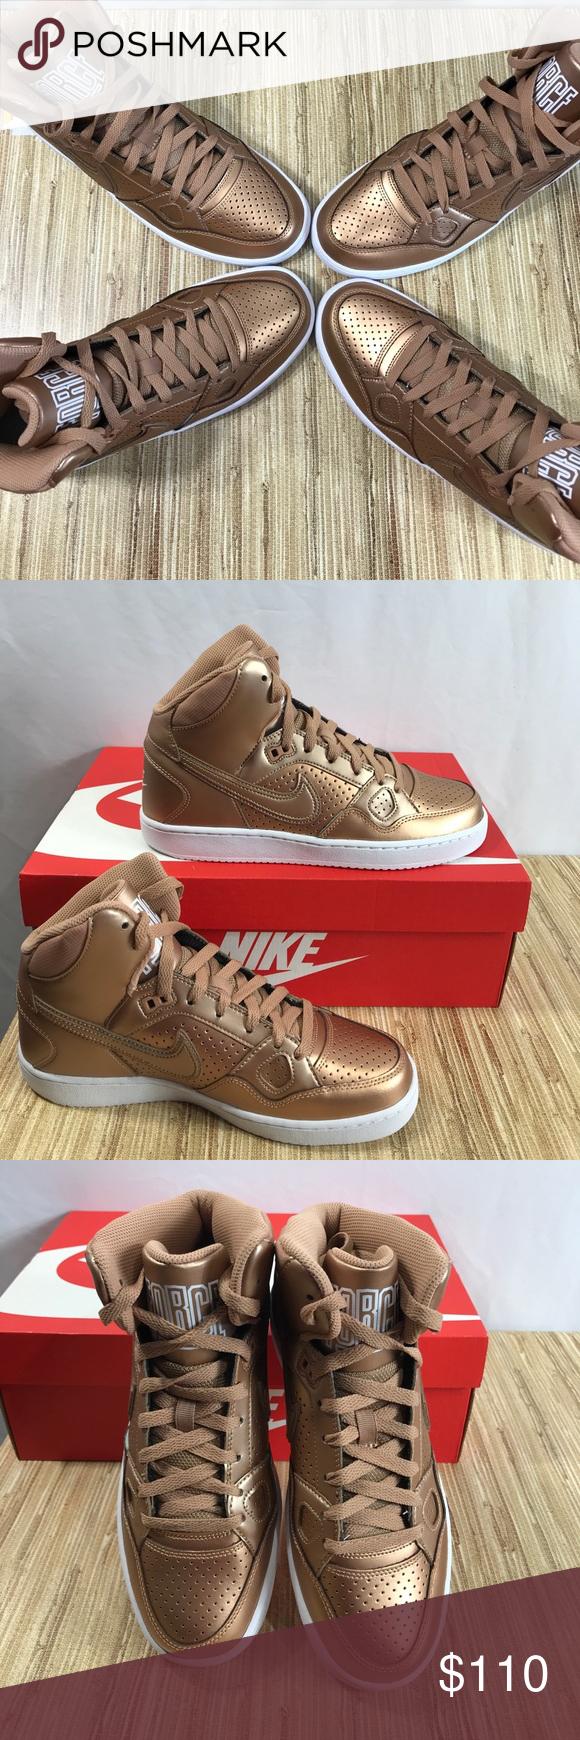 "c20b5e029f6c Bronze Nike Air Rose Gold Sneakers Metallic ""Metallic Bronze Beauties""  PRICE FIRM Son of Force Sneakers Rose Gold Air Force High Top Authentic  Shoes New in ..."